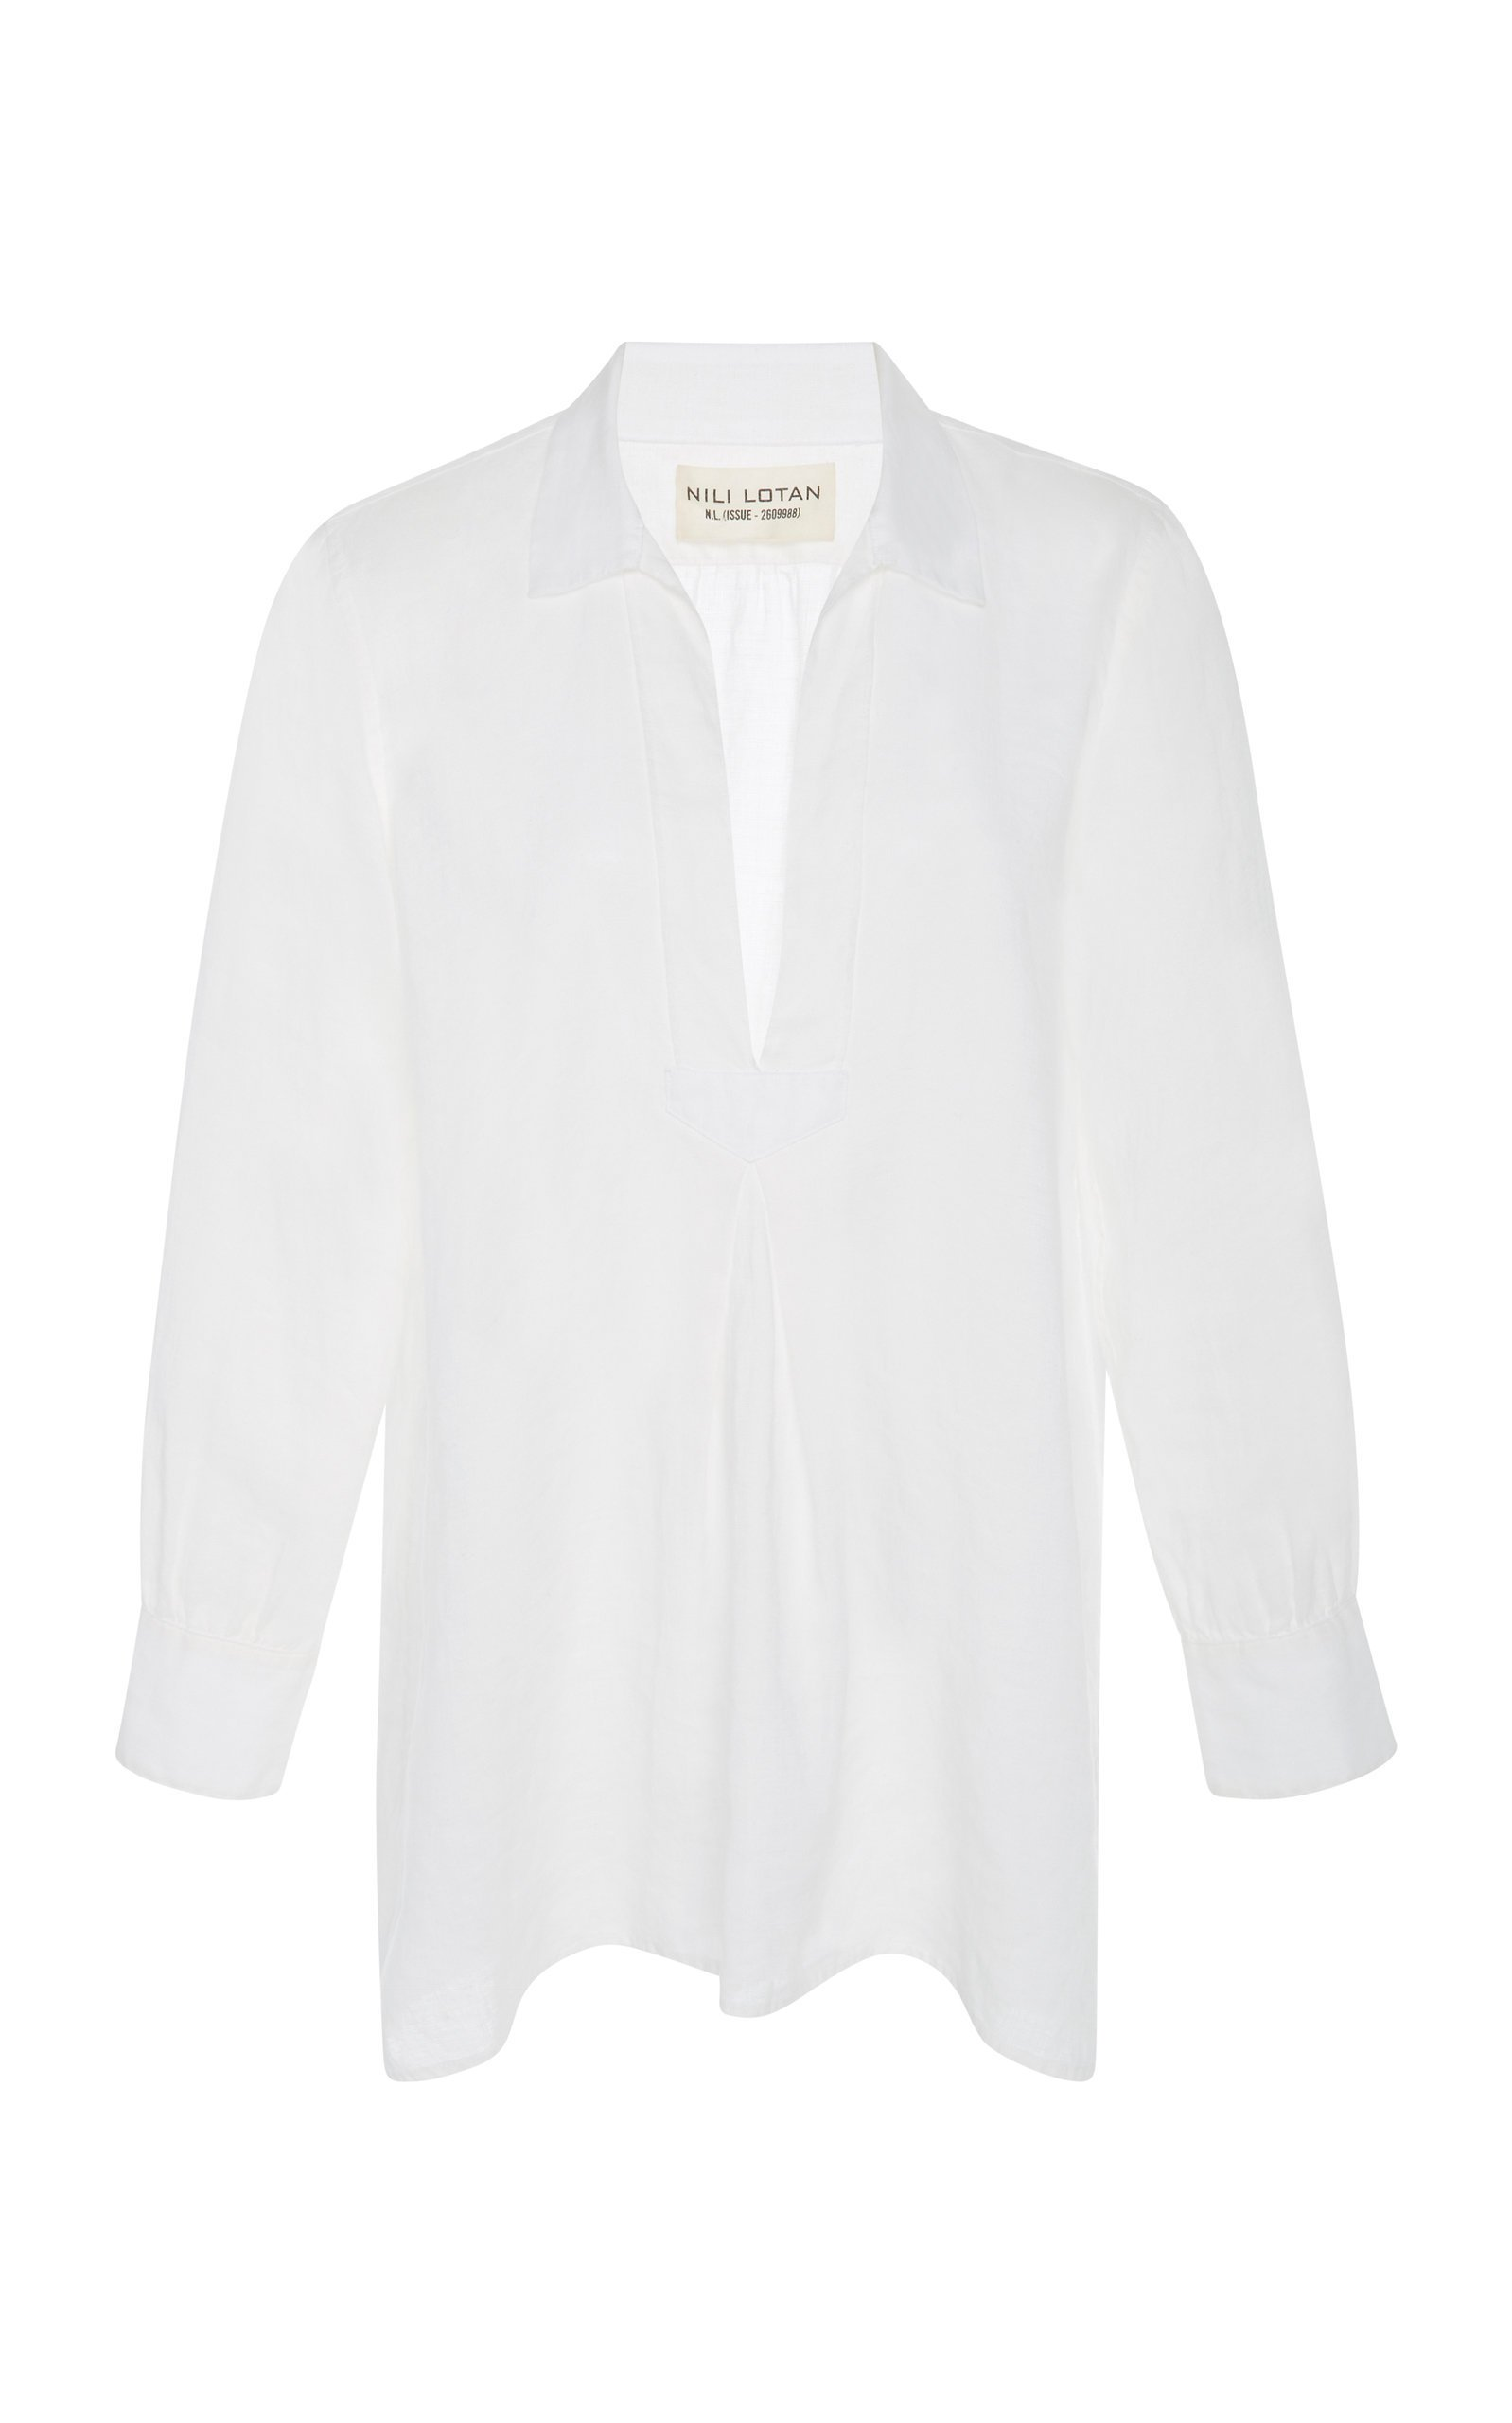 NILI LOTAN Emma Linen Shirt